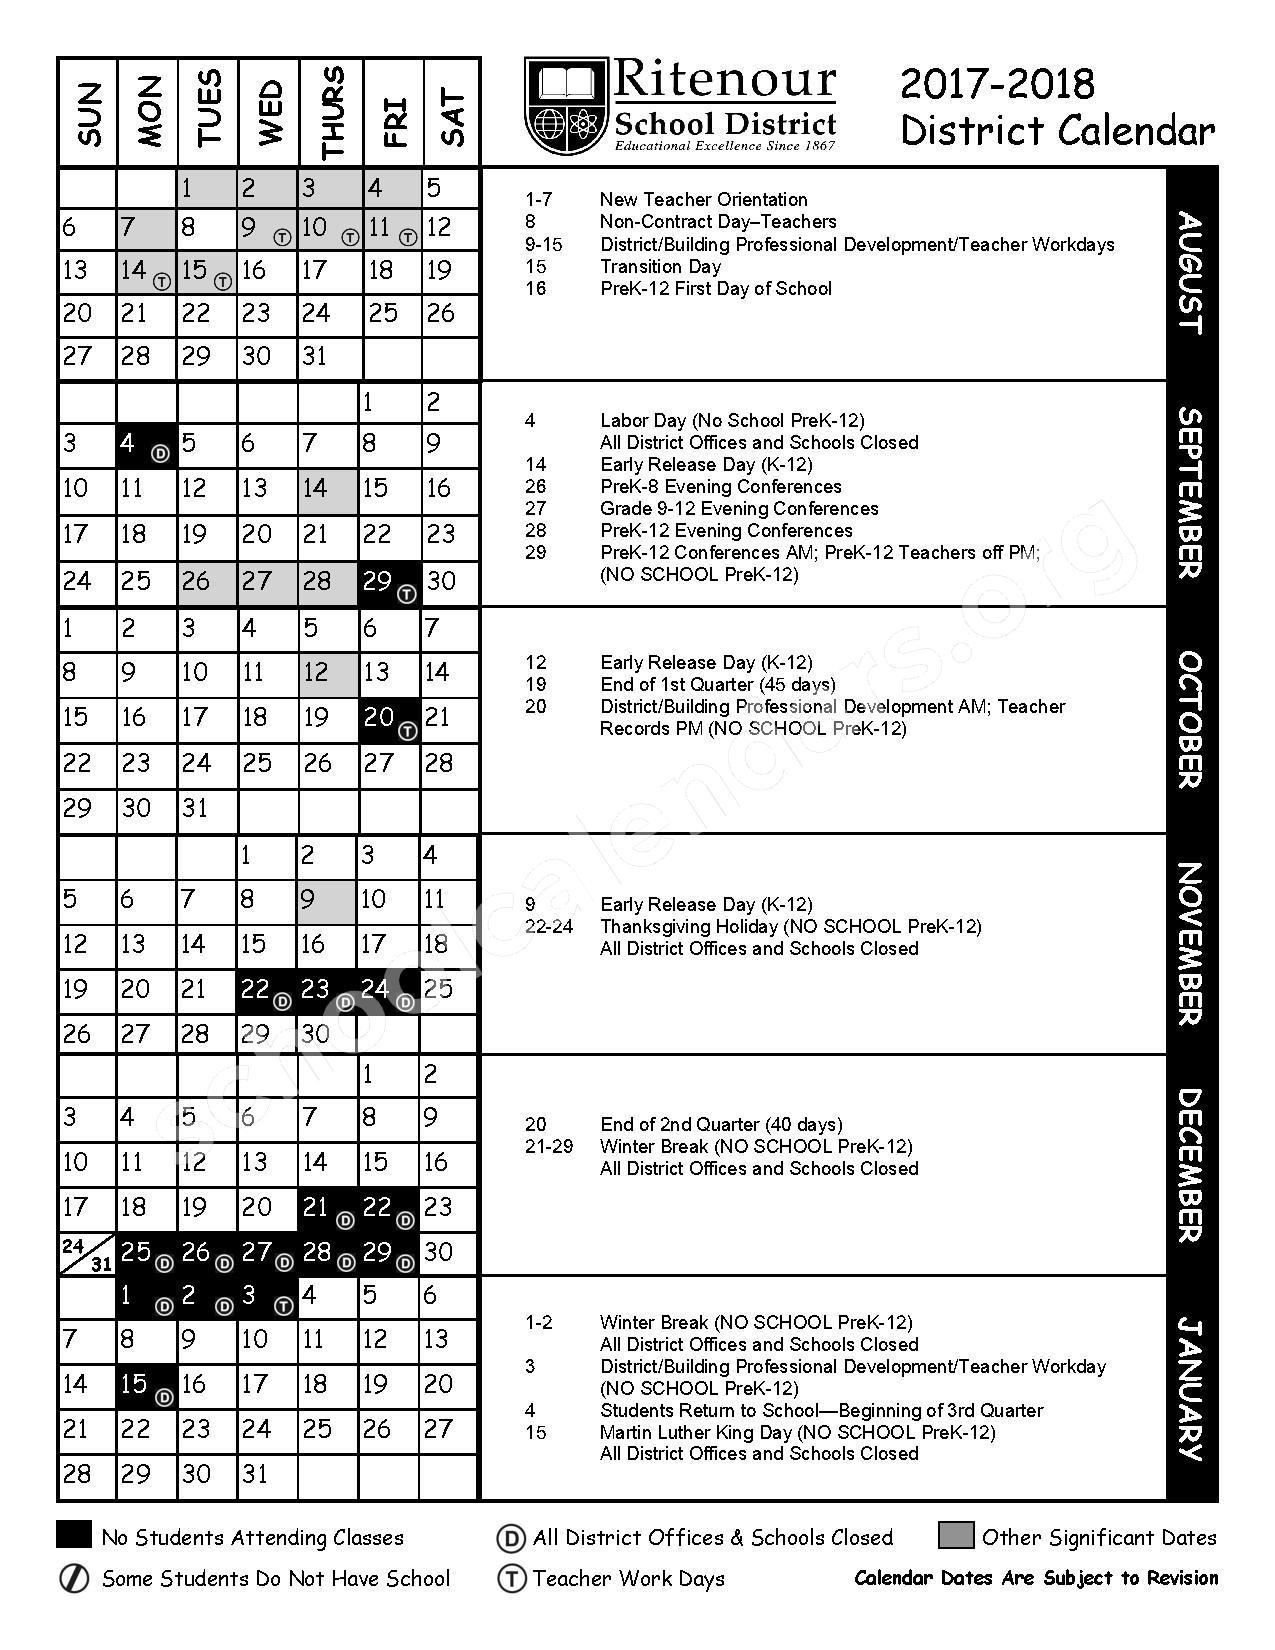 2017 - 2018 District Calendar – Ritenour School District – page 1